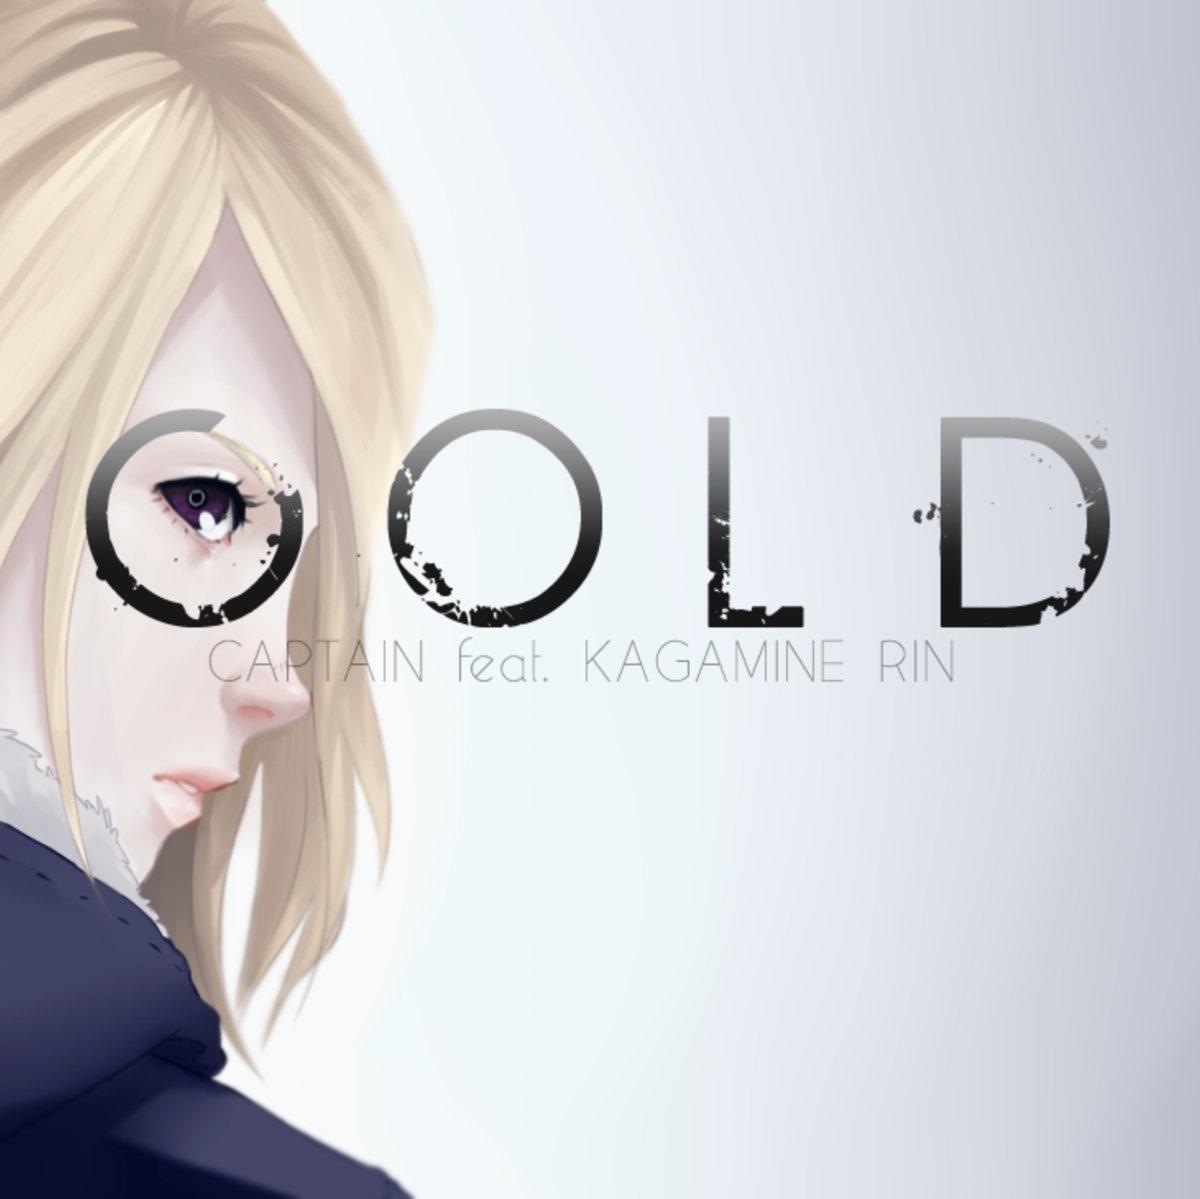 Cold/Captain